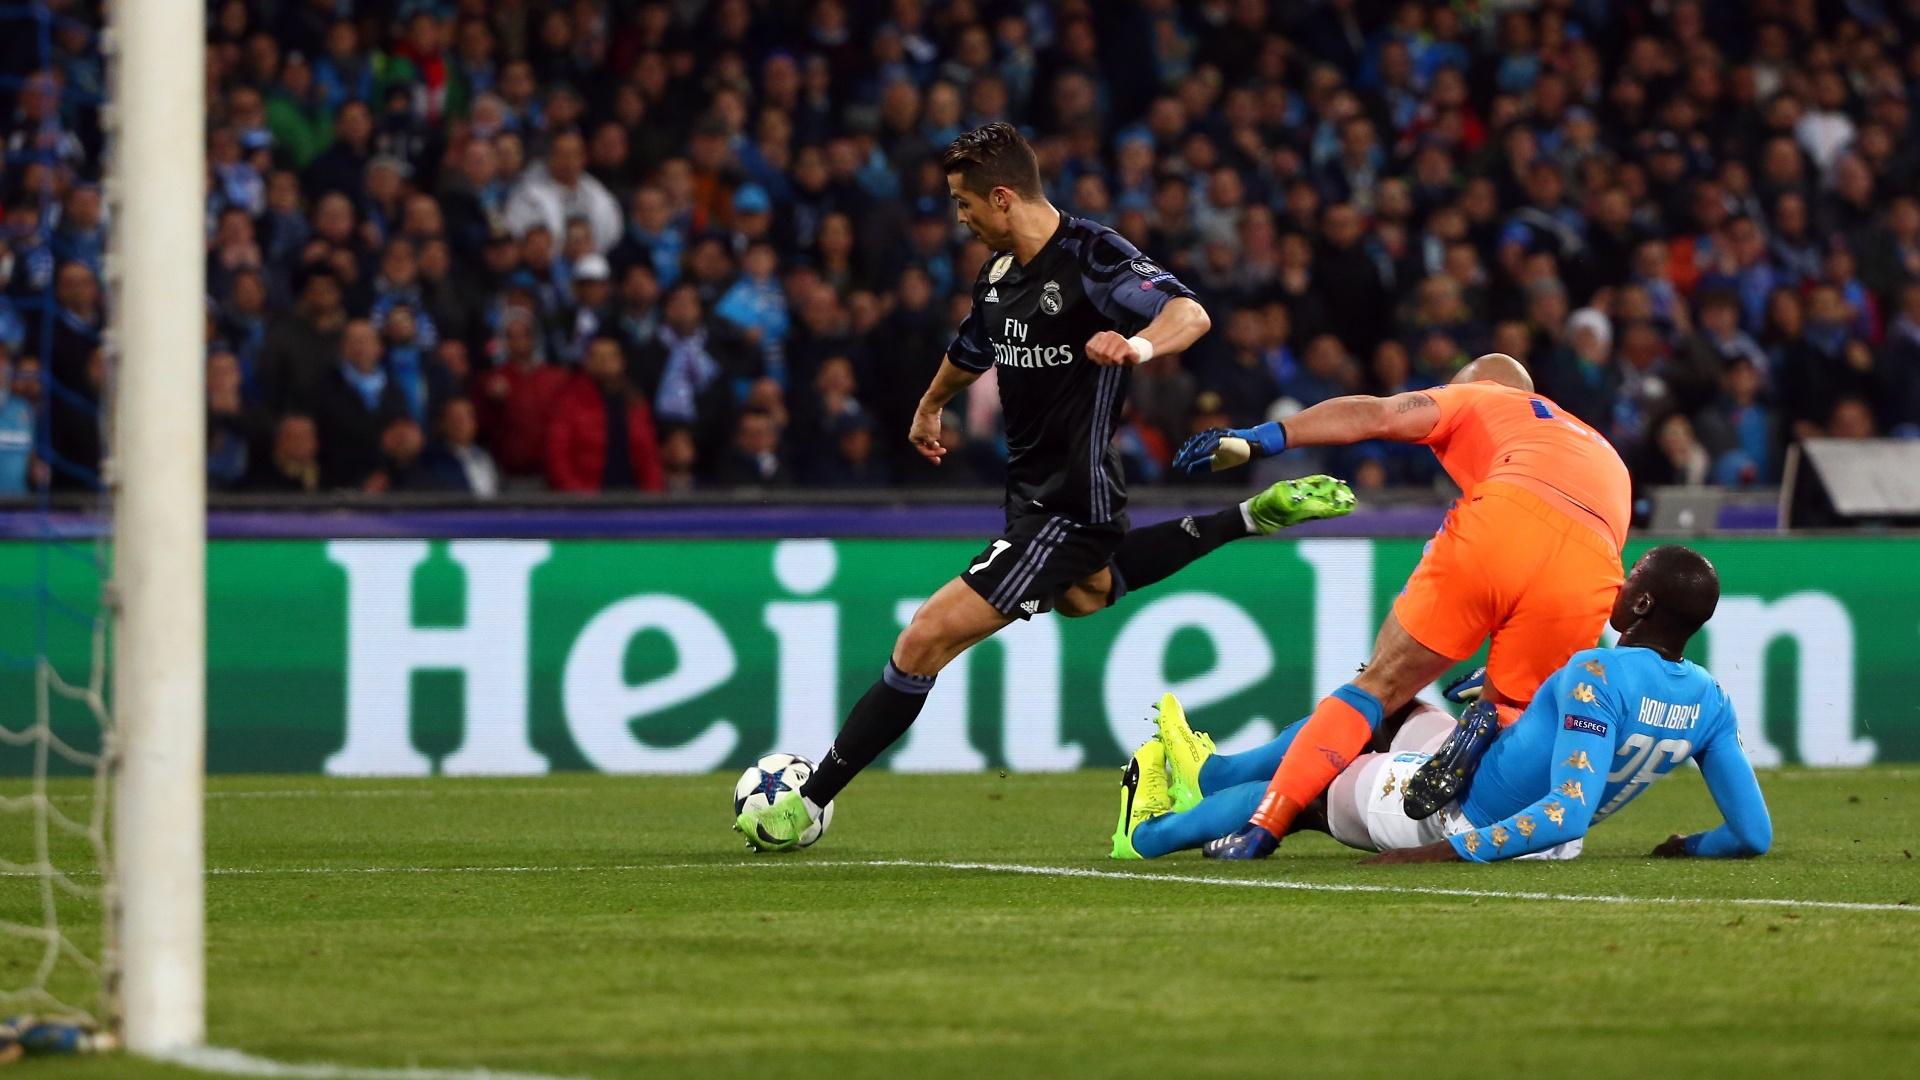 Cristiano Ronaldo dribla Reina, mas acerta a trave do Napoli